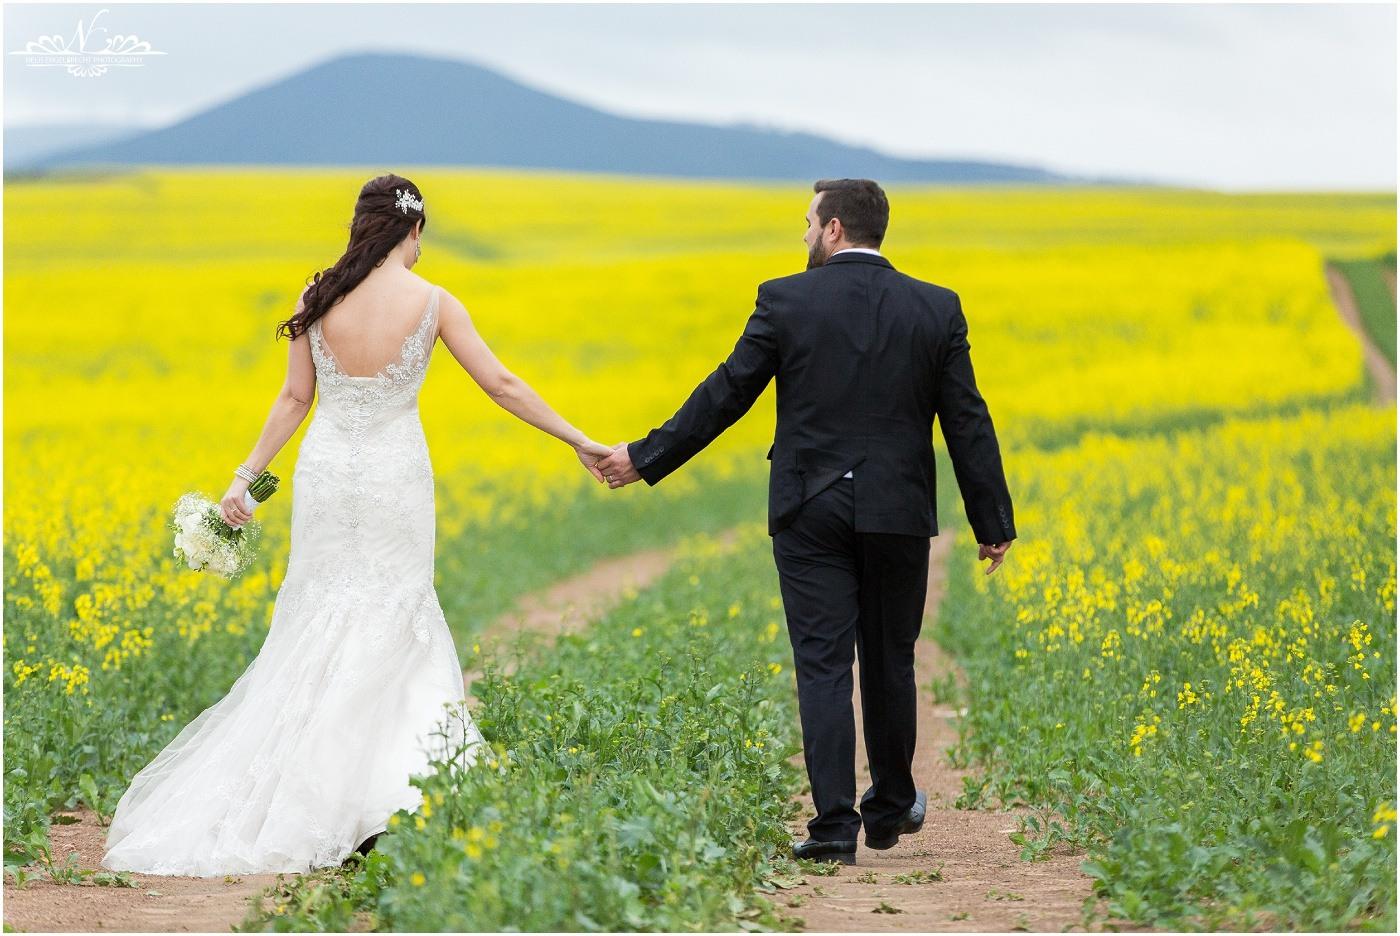 Eensgezind-Wedding-Photos-Nelis-Engelbrecht-Photography-125